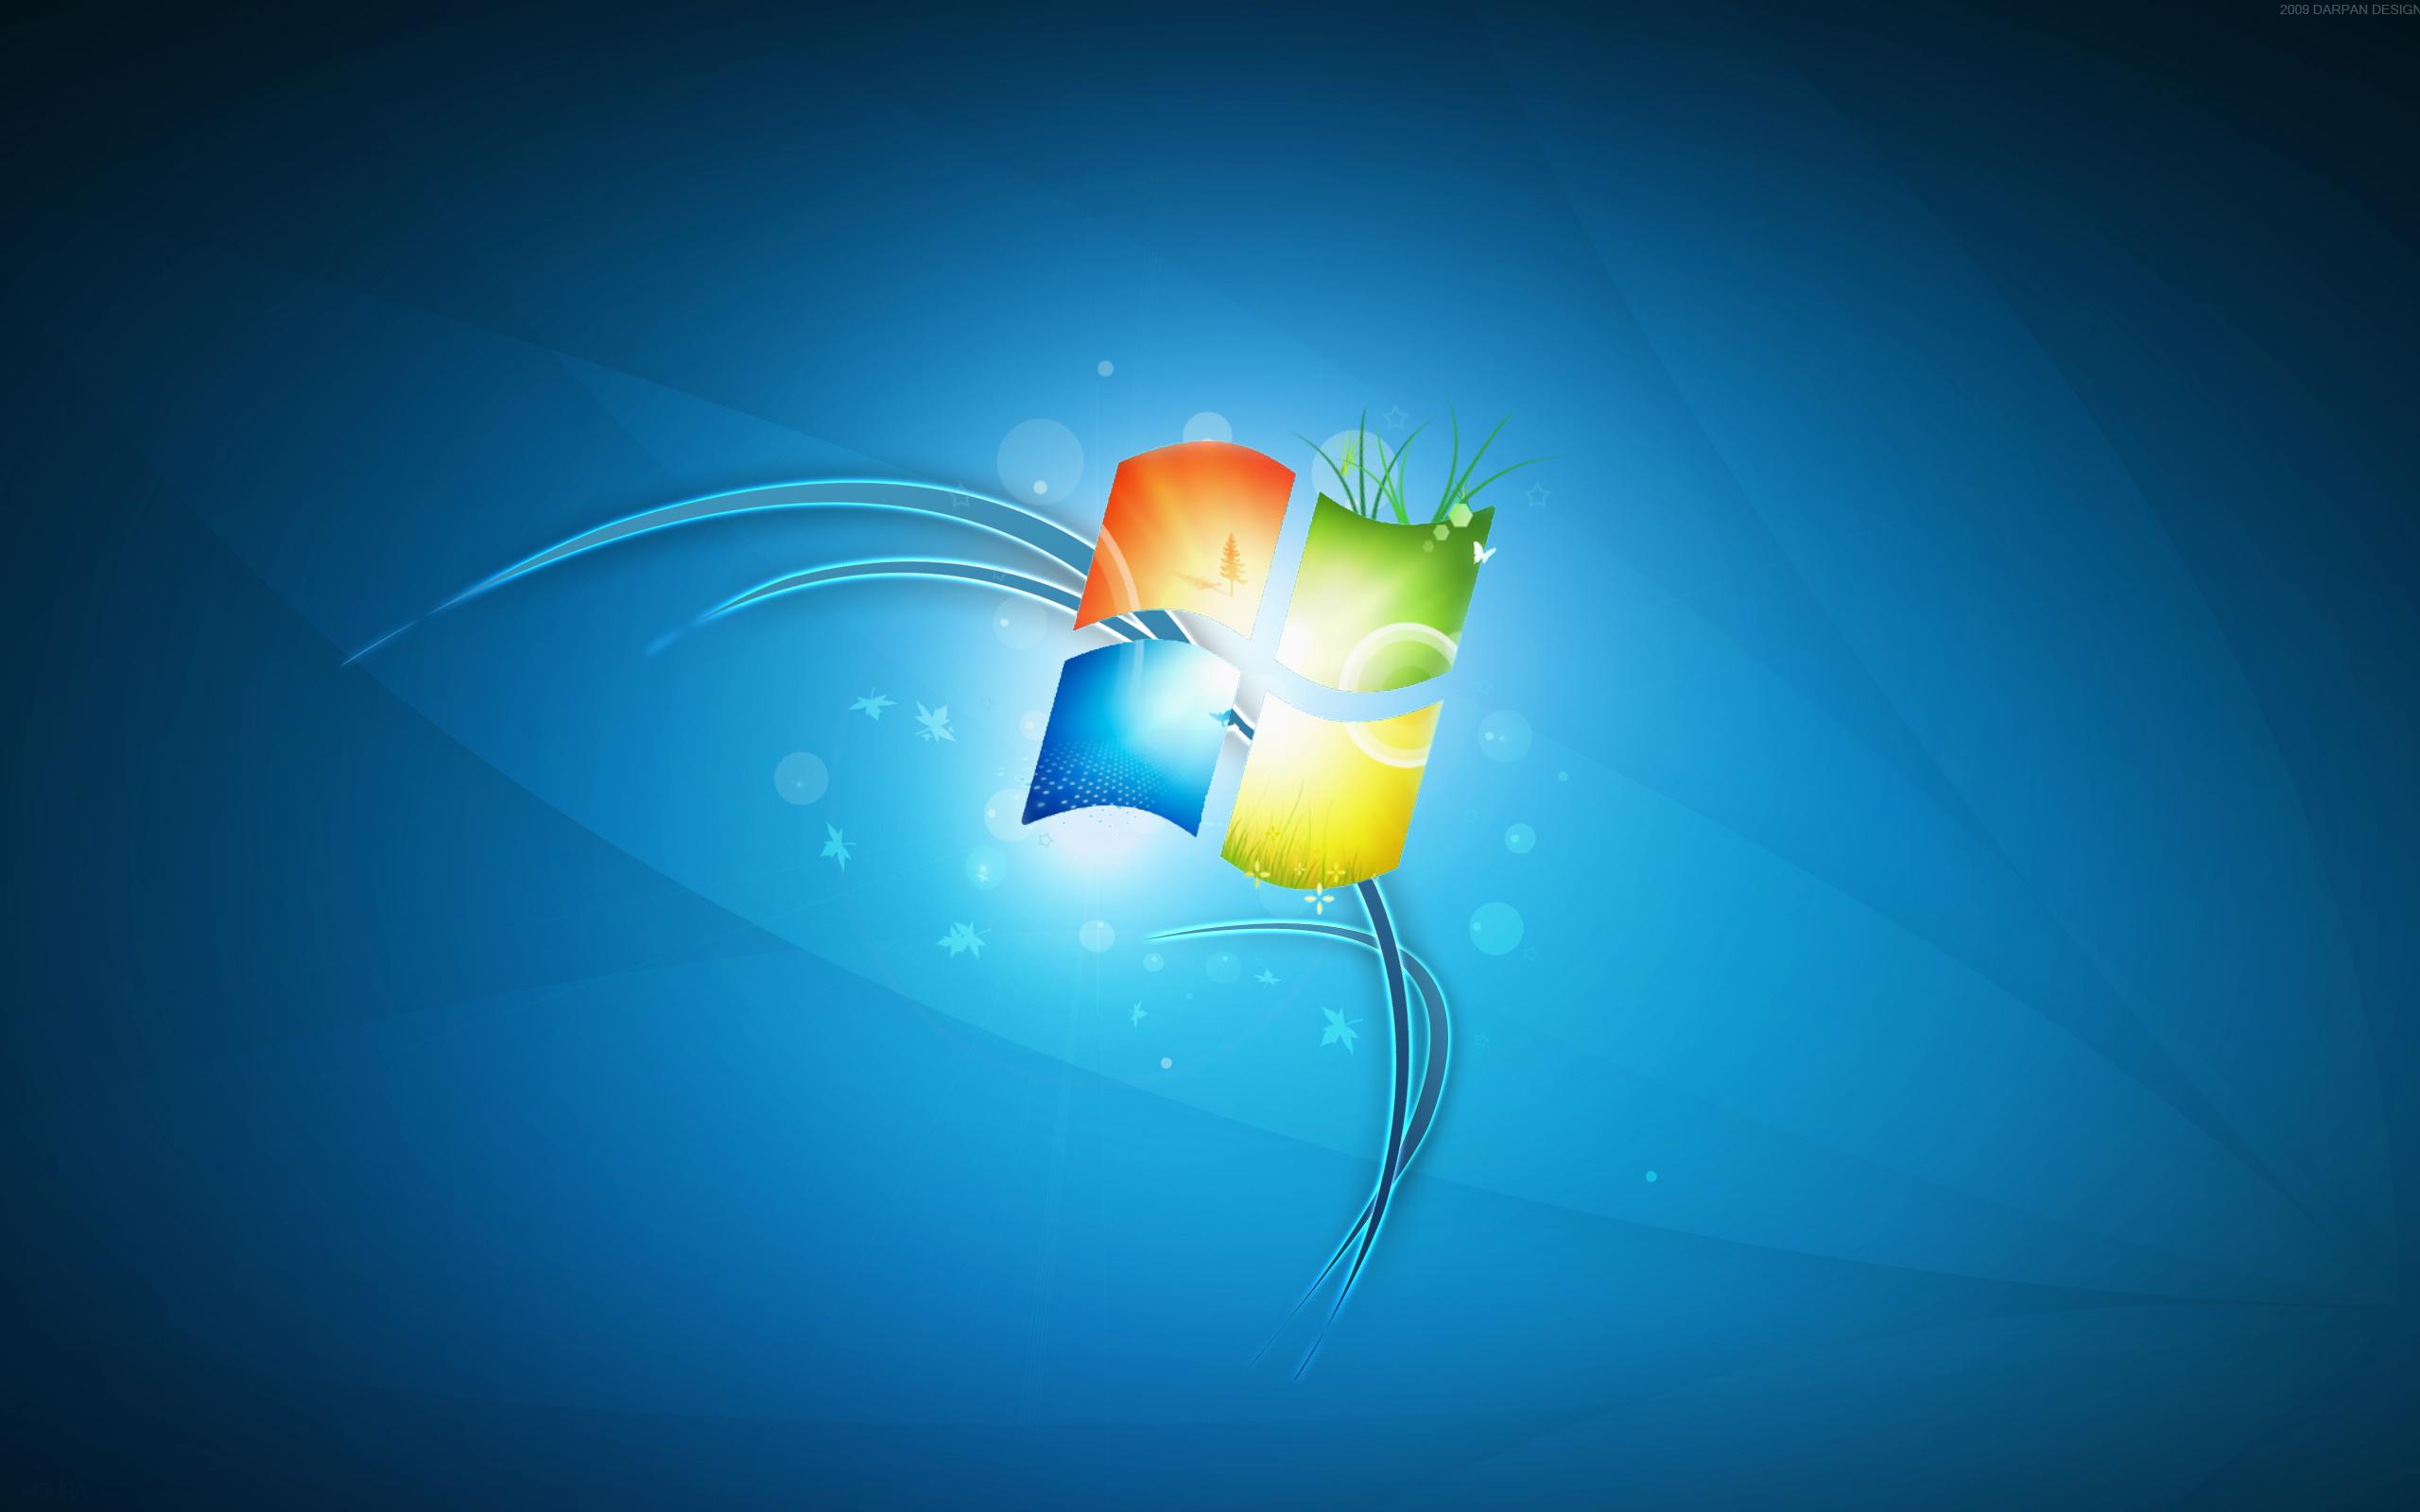 Theme Bin187 Blog Archive 187 Windows 7 Ultimate HD Wallpaper 2560x1600